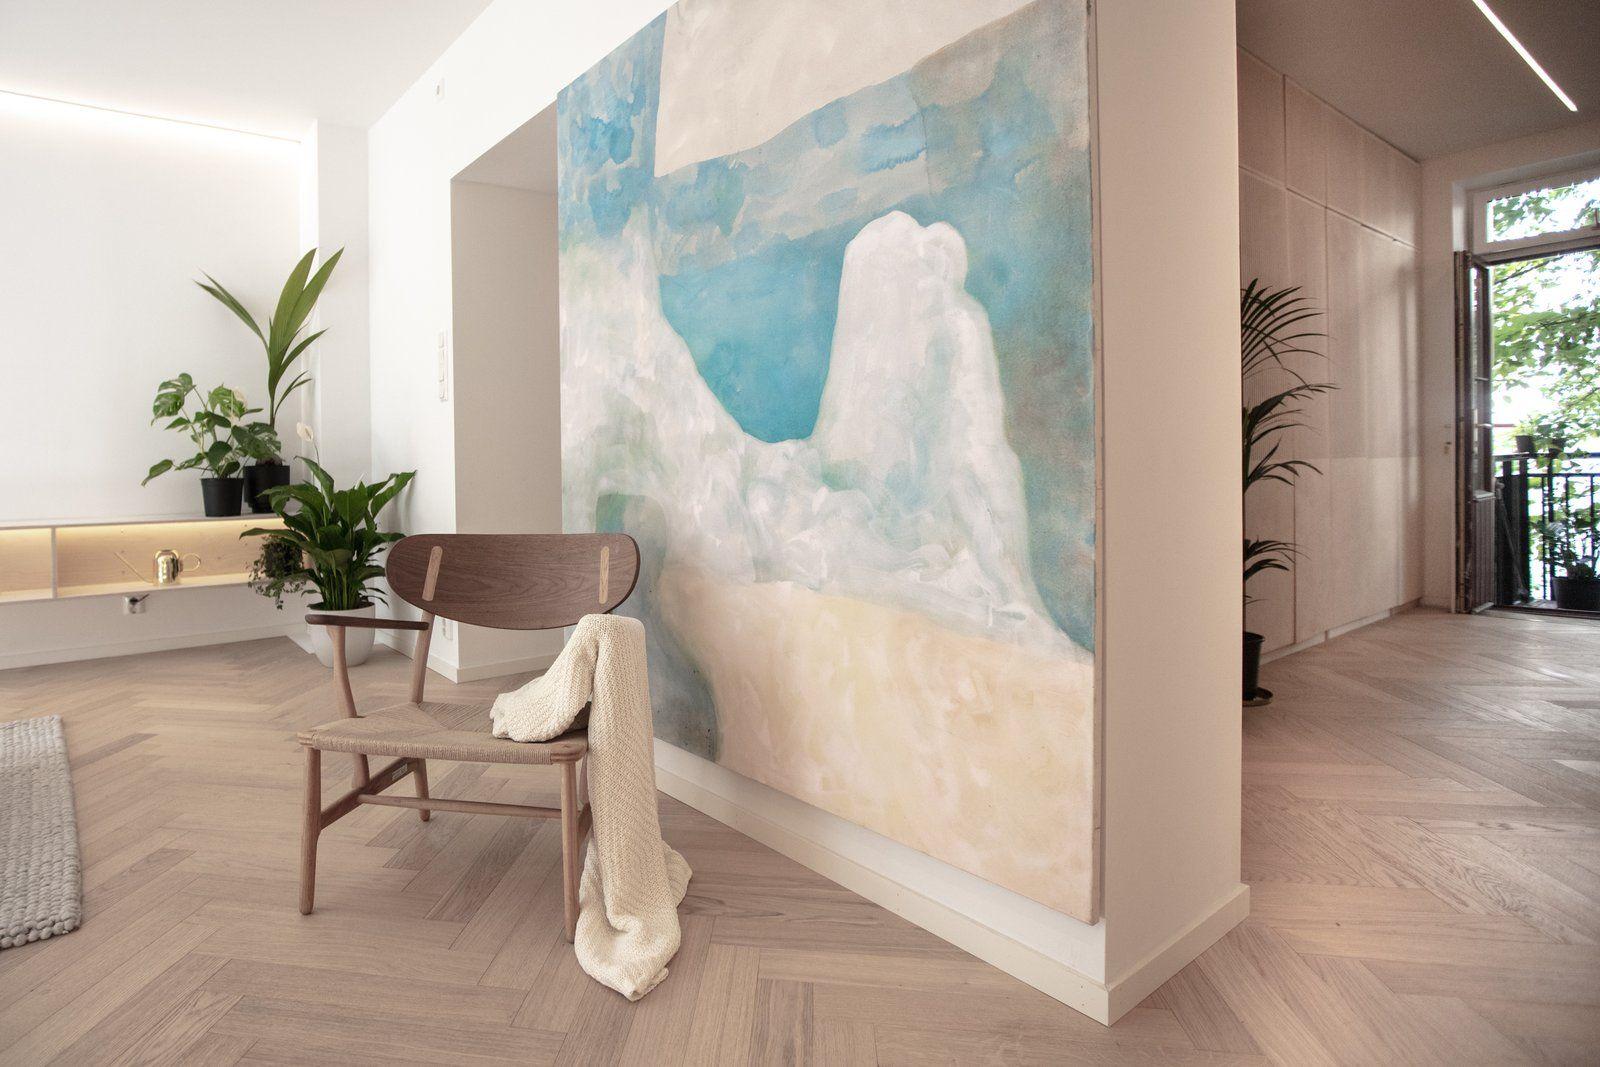 Master bedroom hardwood floors  ScandinavianJapanese concept home in Oslo city center  Hogar dulce